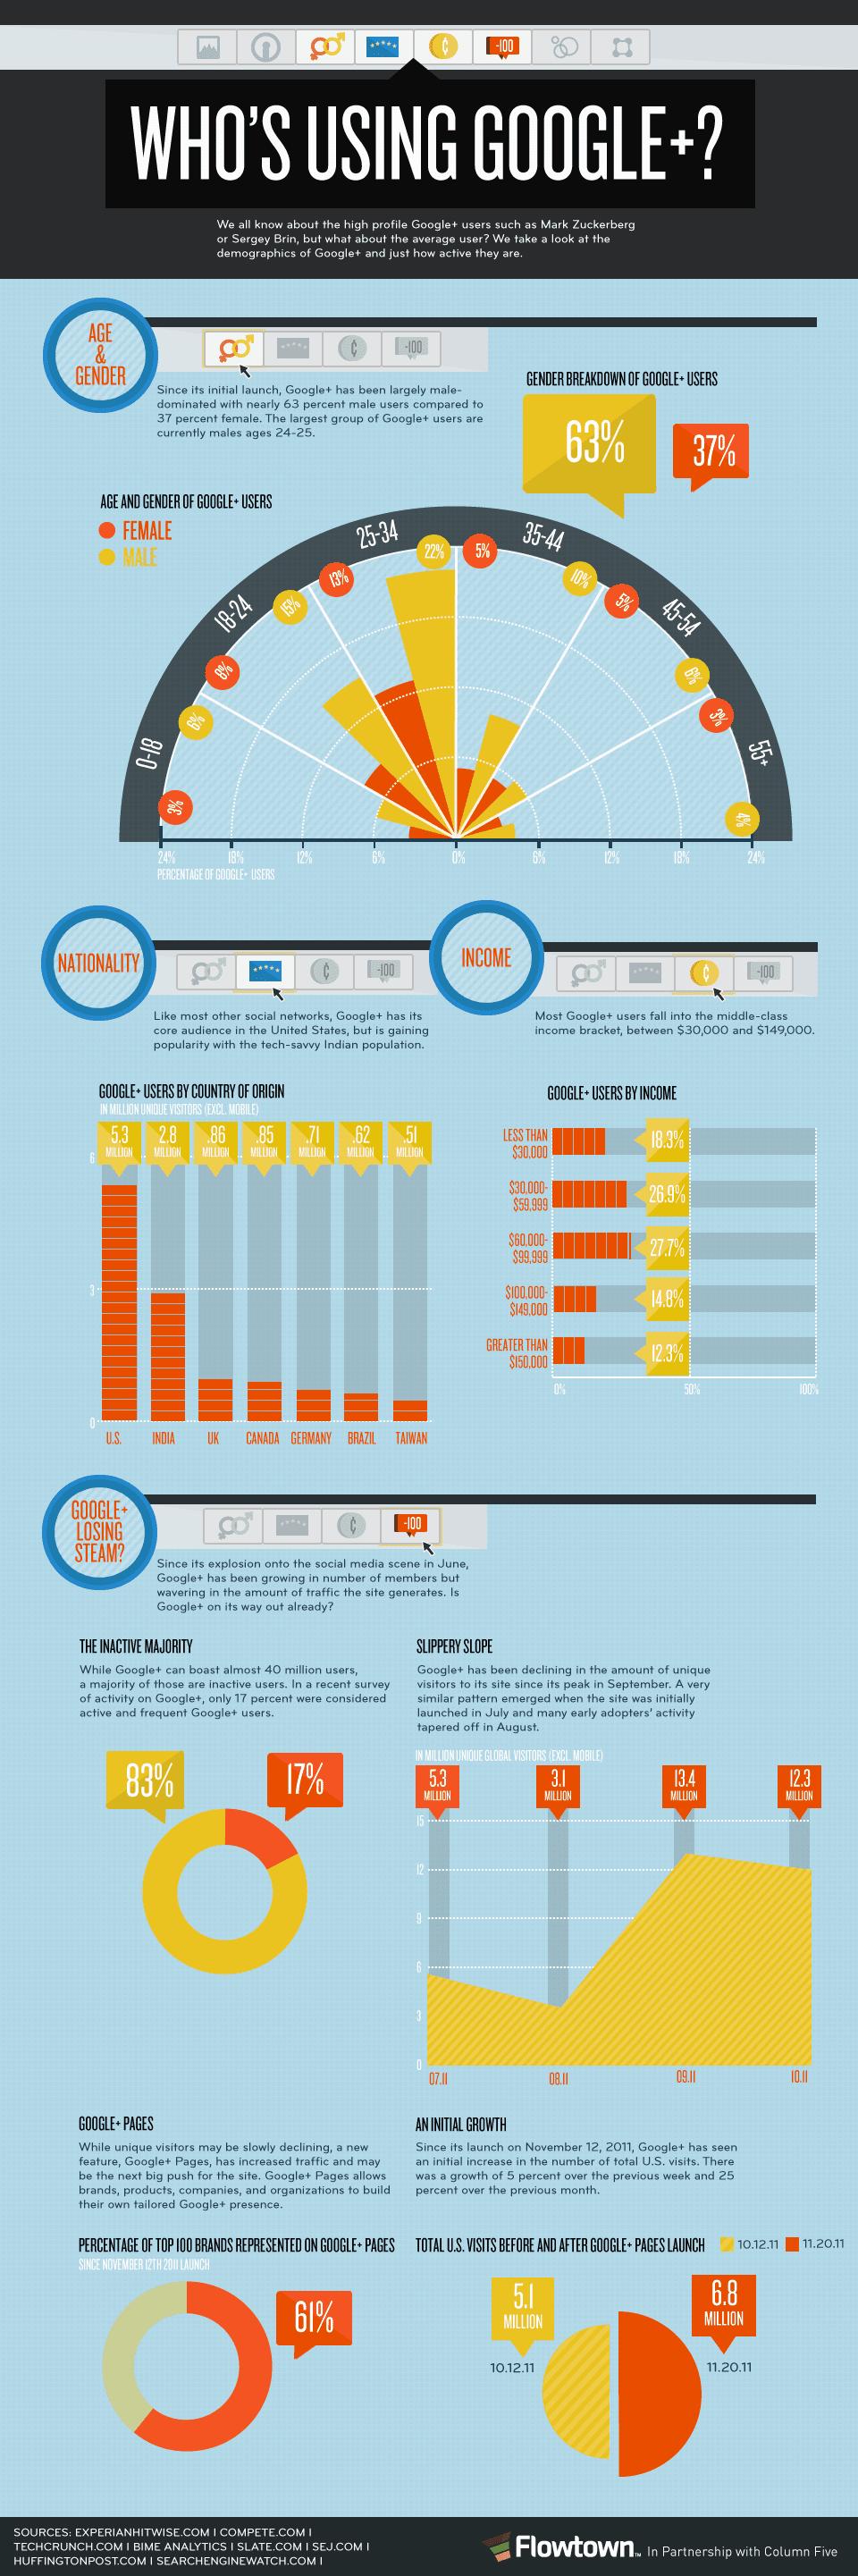 Google Plus Infographic - Who Uses Google+